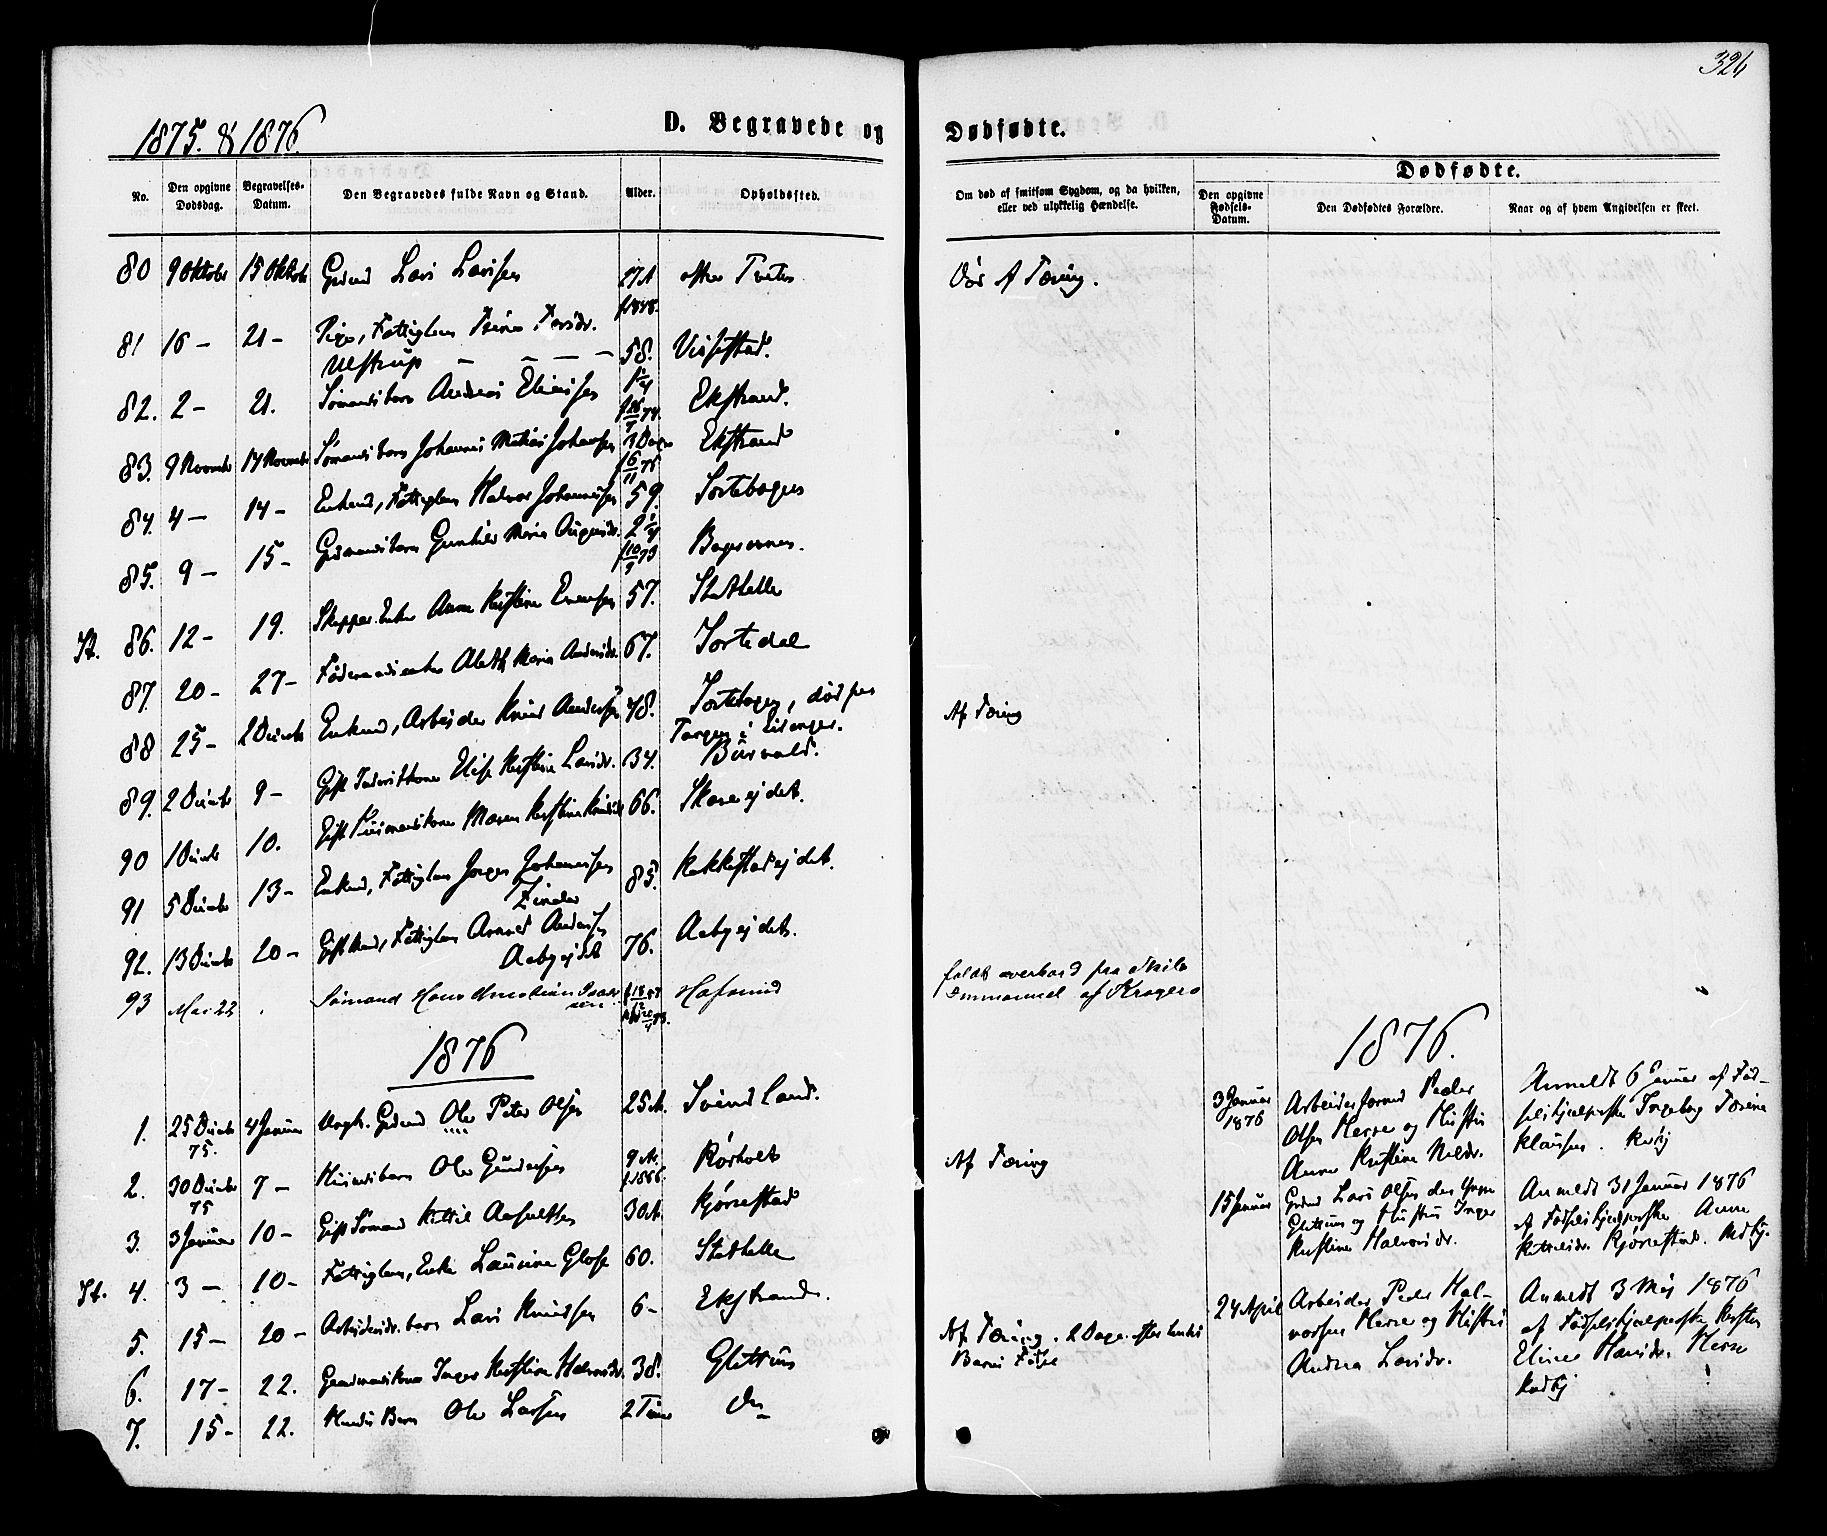 SAKO, Bamble kirkebøker, F/Fa/L0006: Ministerialbok nr. I 6, 1869-1877, s. 326